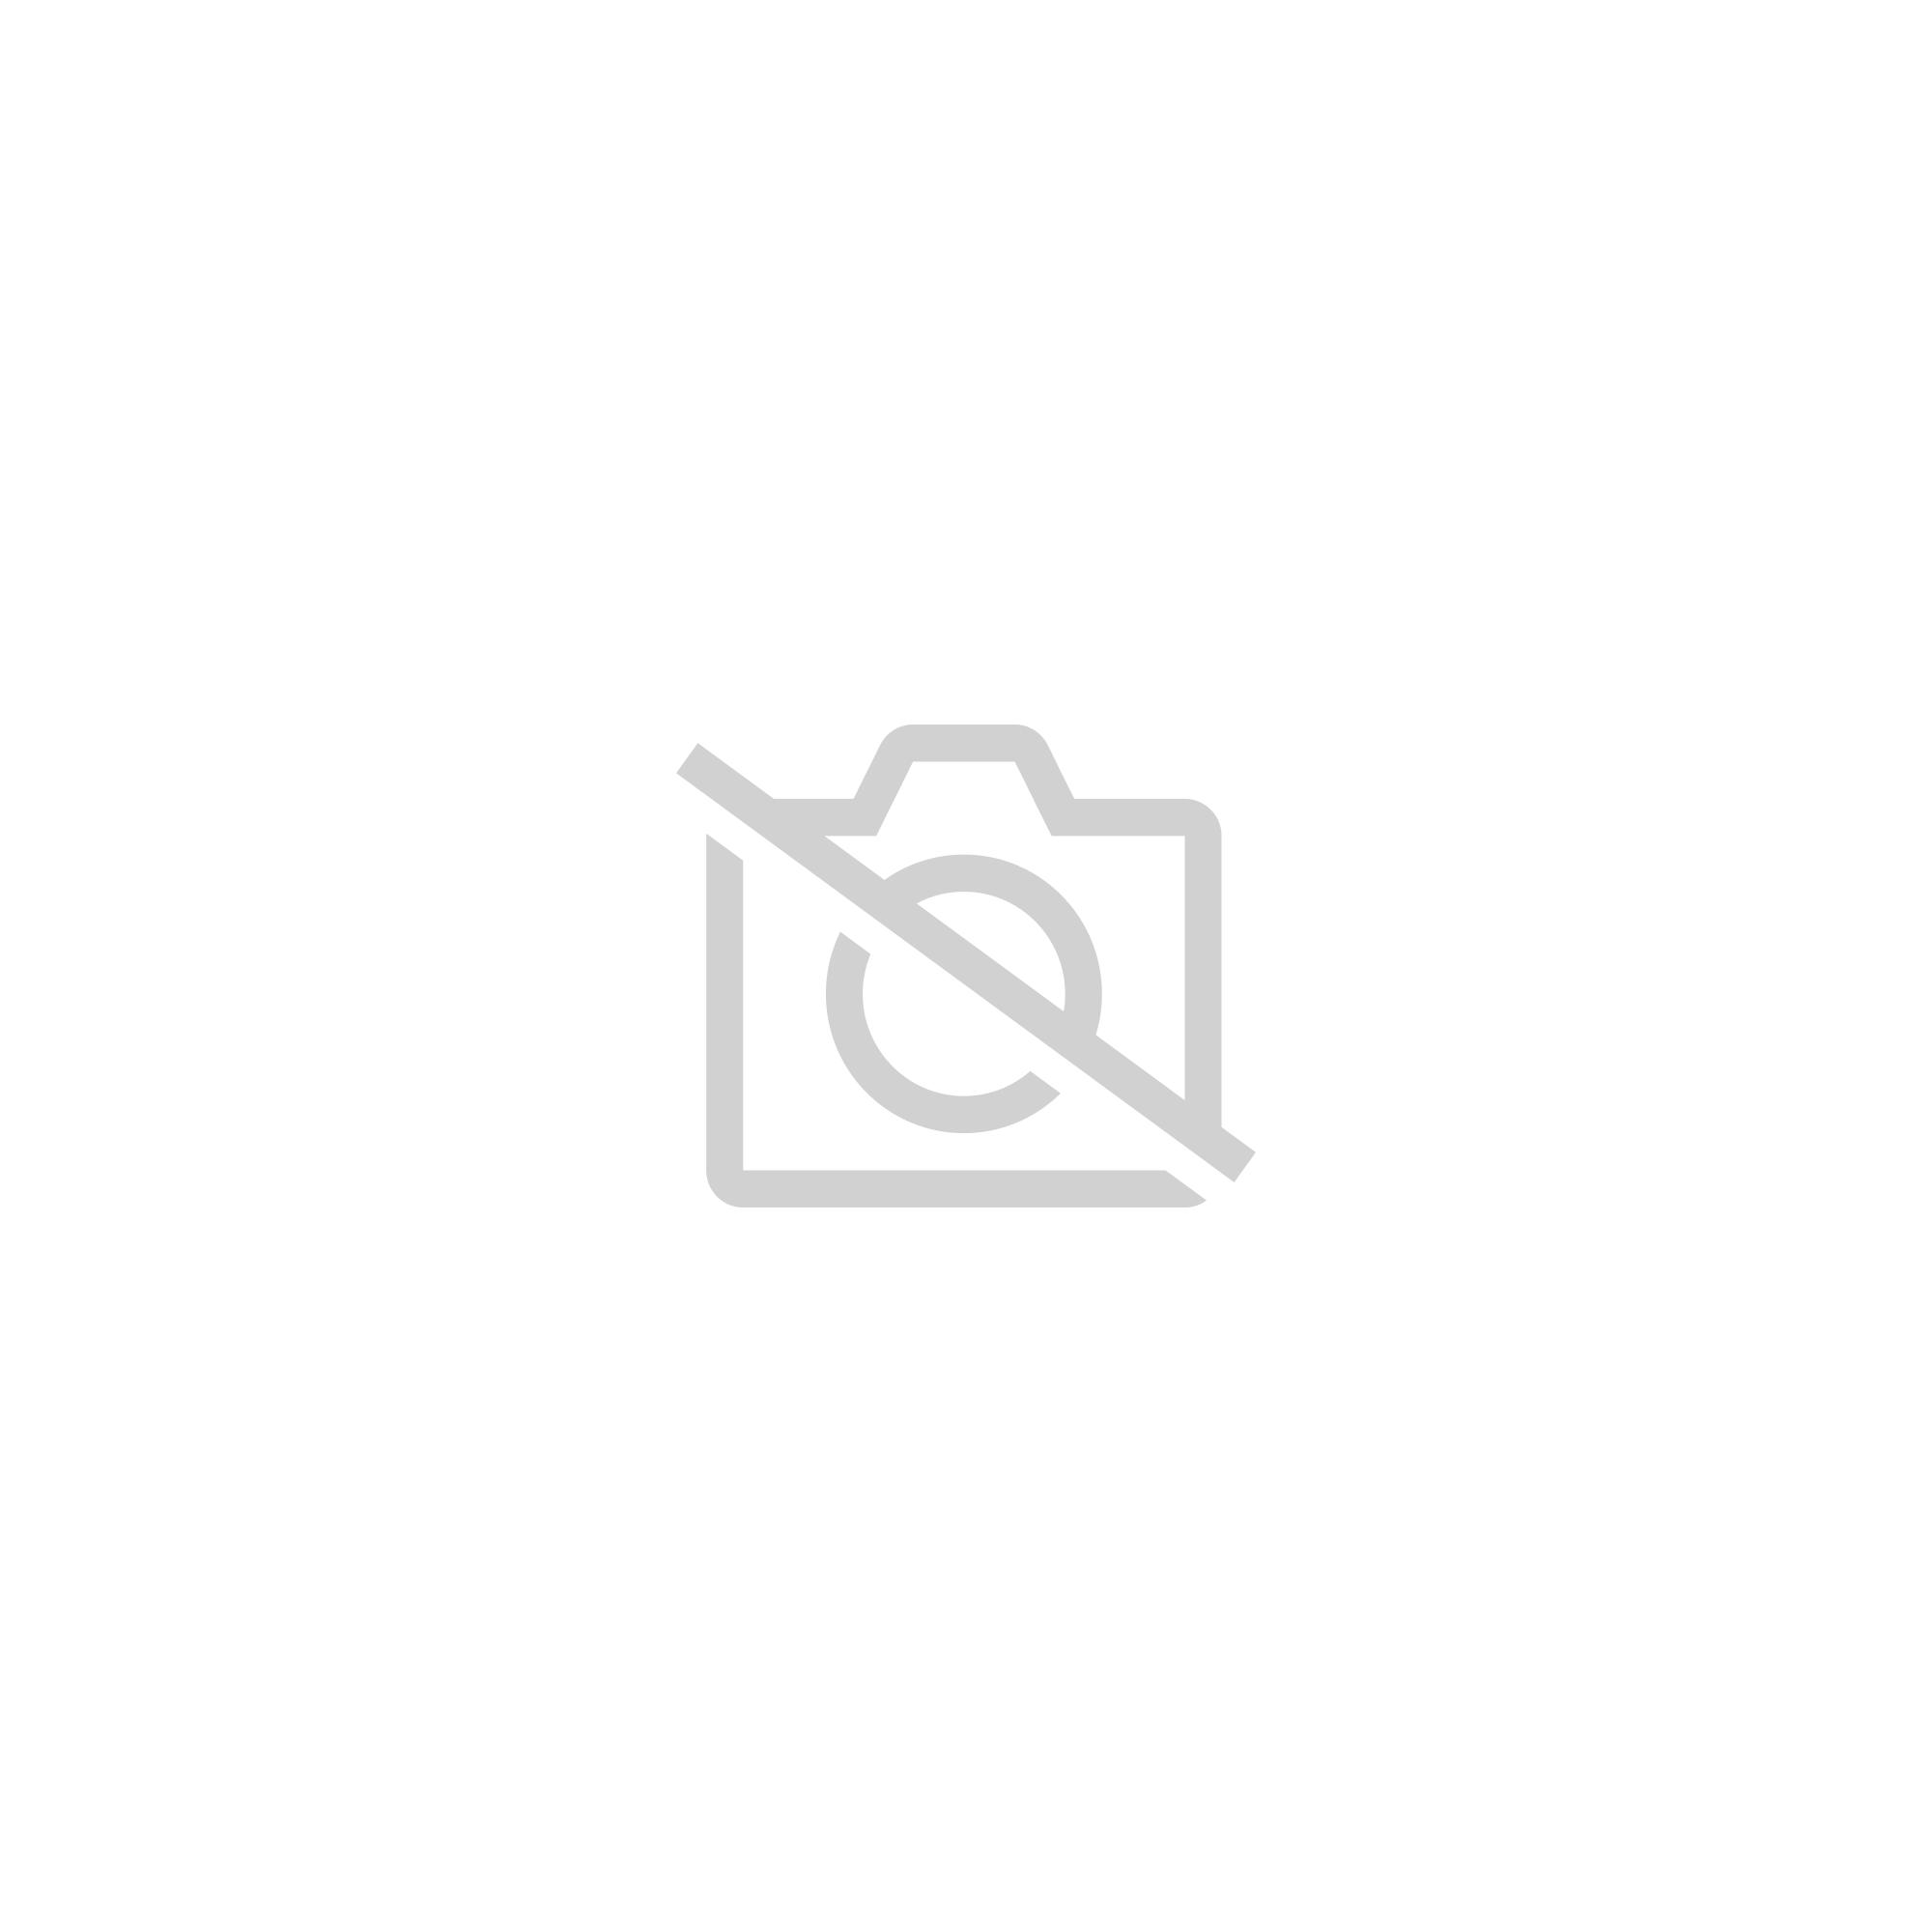 Tapis de sol Déco-Repro D'art Vert-Grenadine